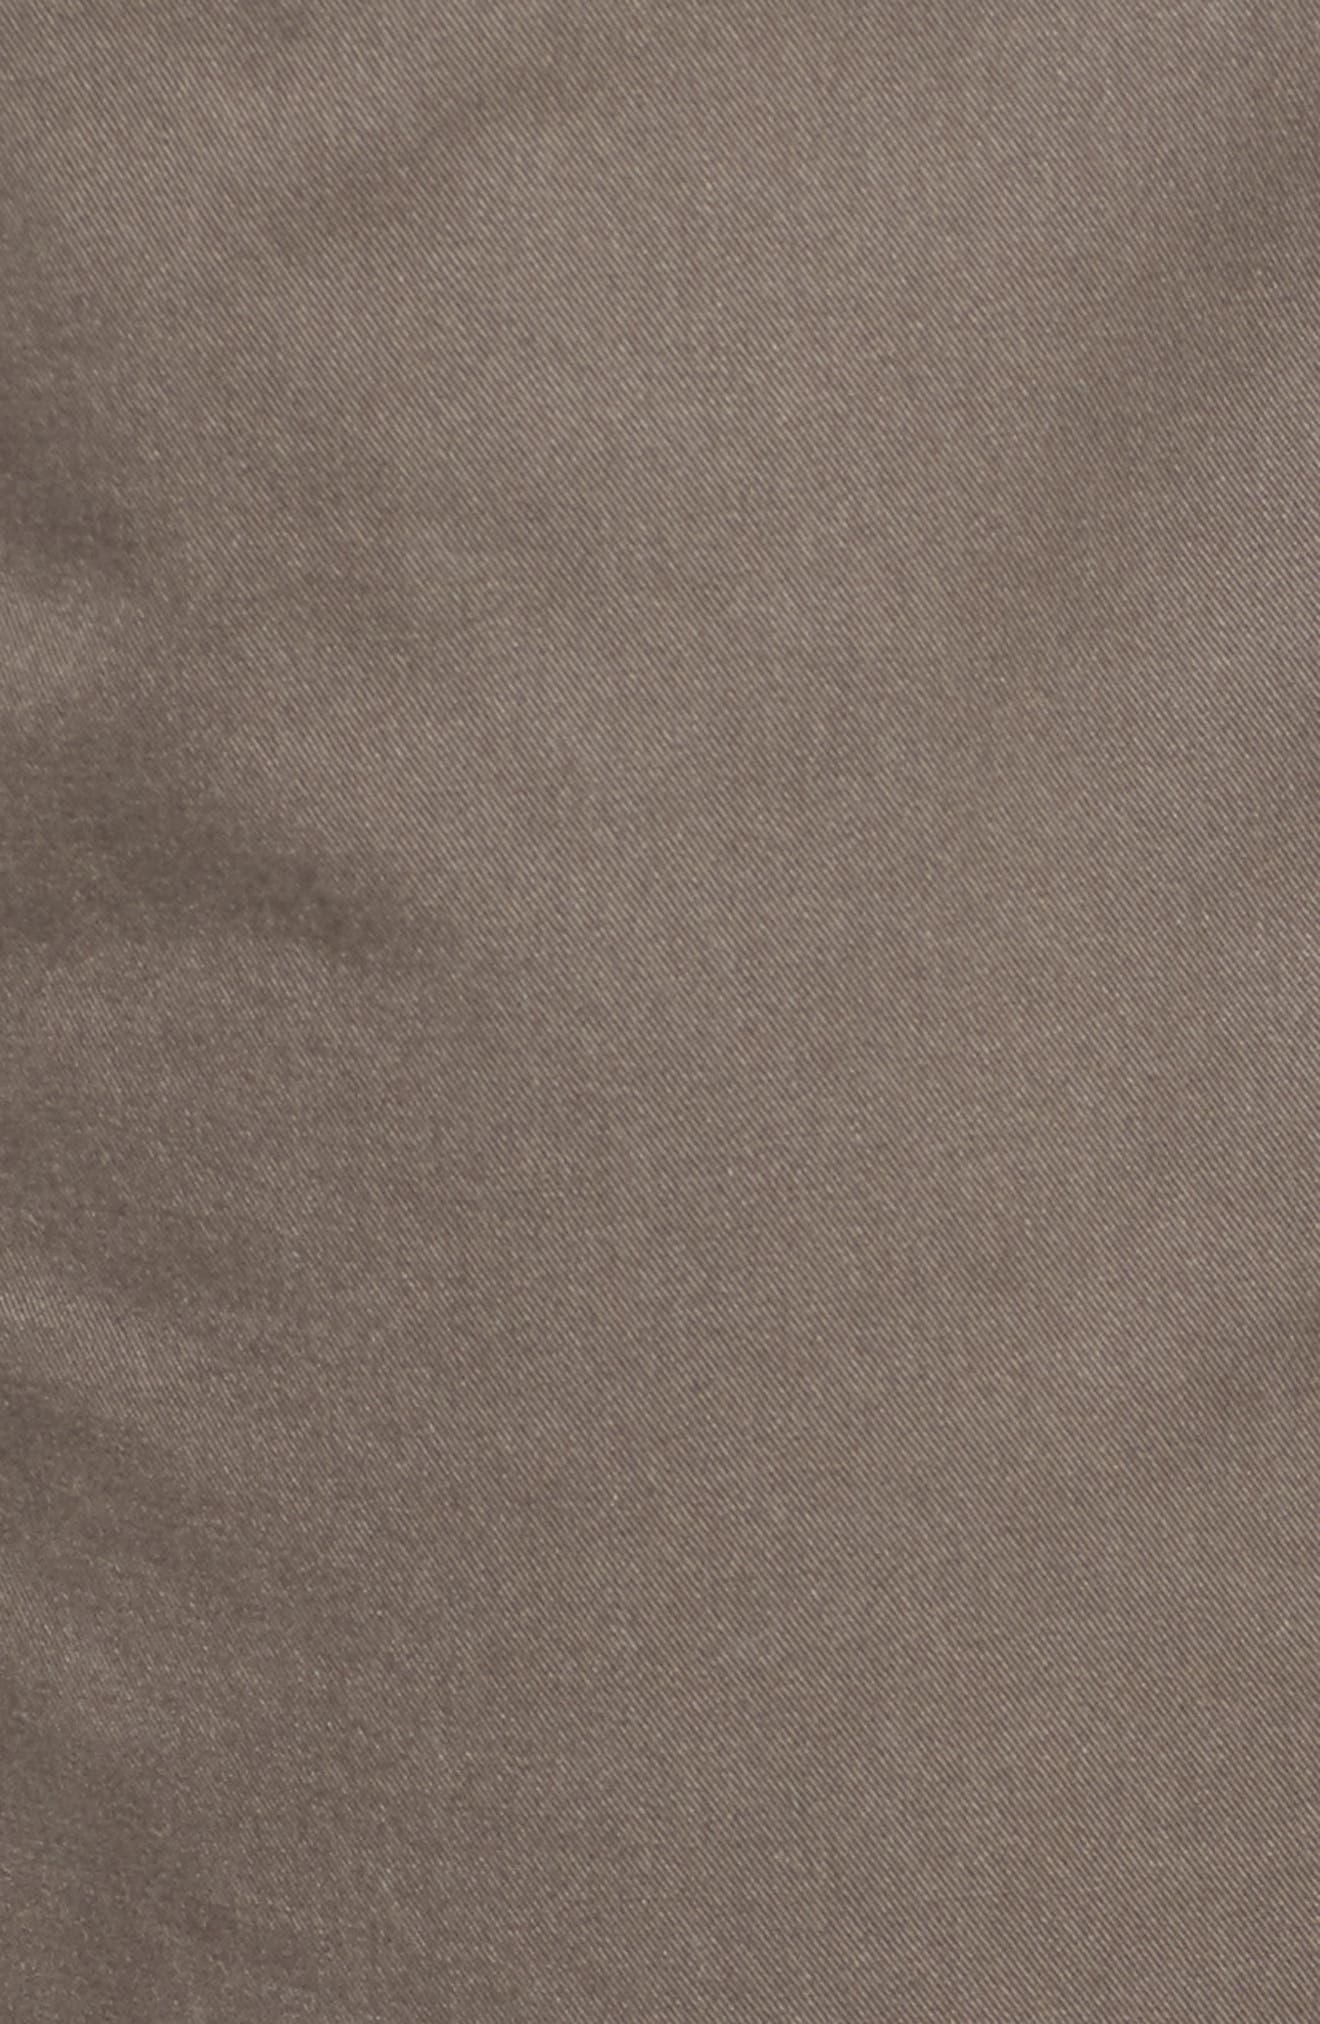 Slim Organic Cotton Blend Pants,                             Alternate thumbnail 5, color,                             Rye